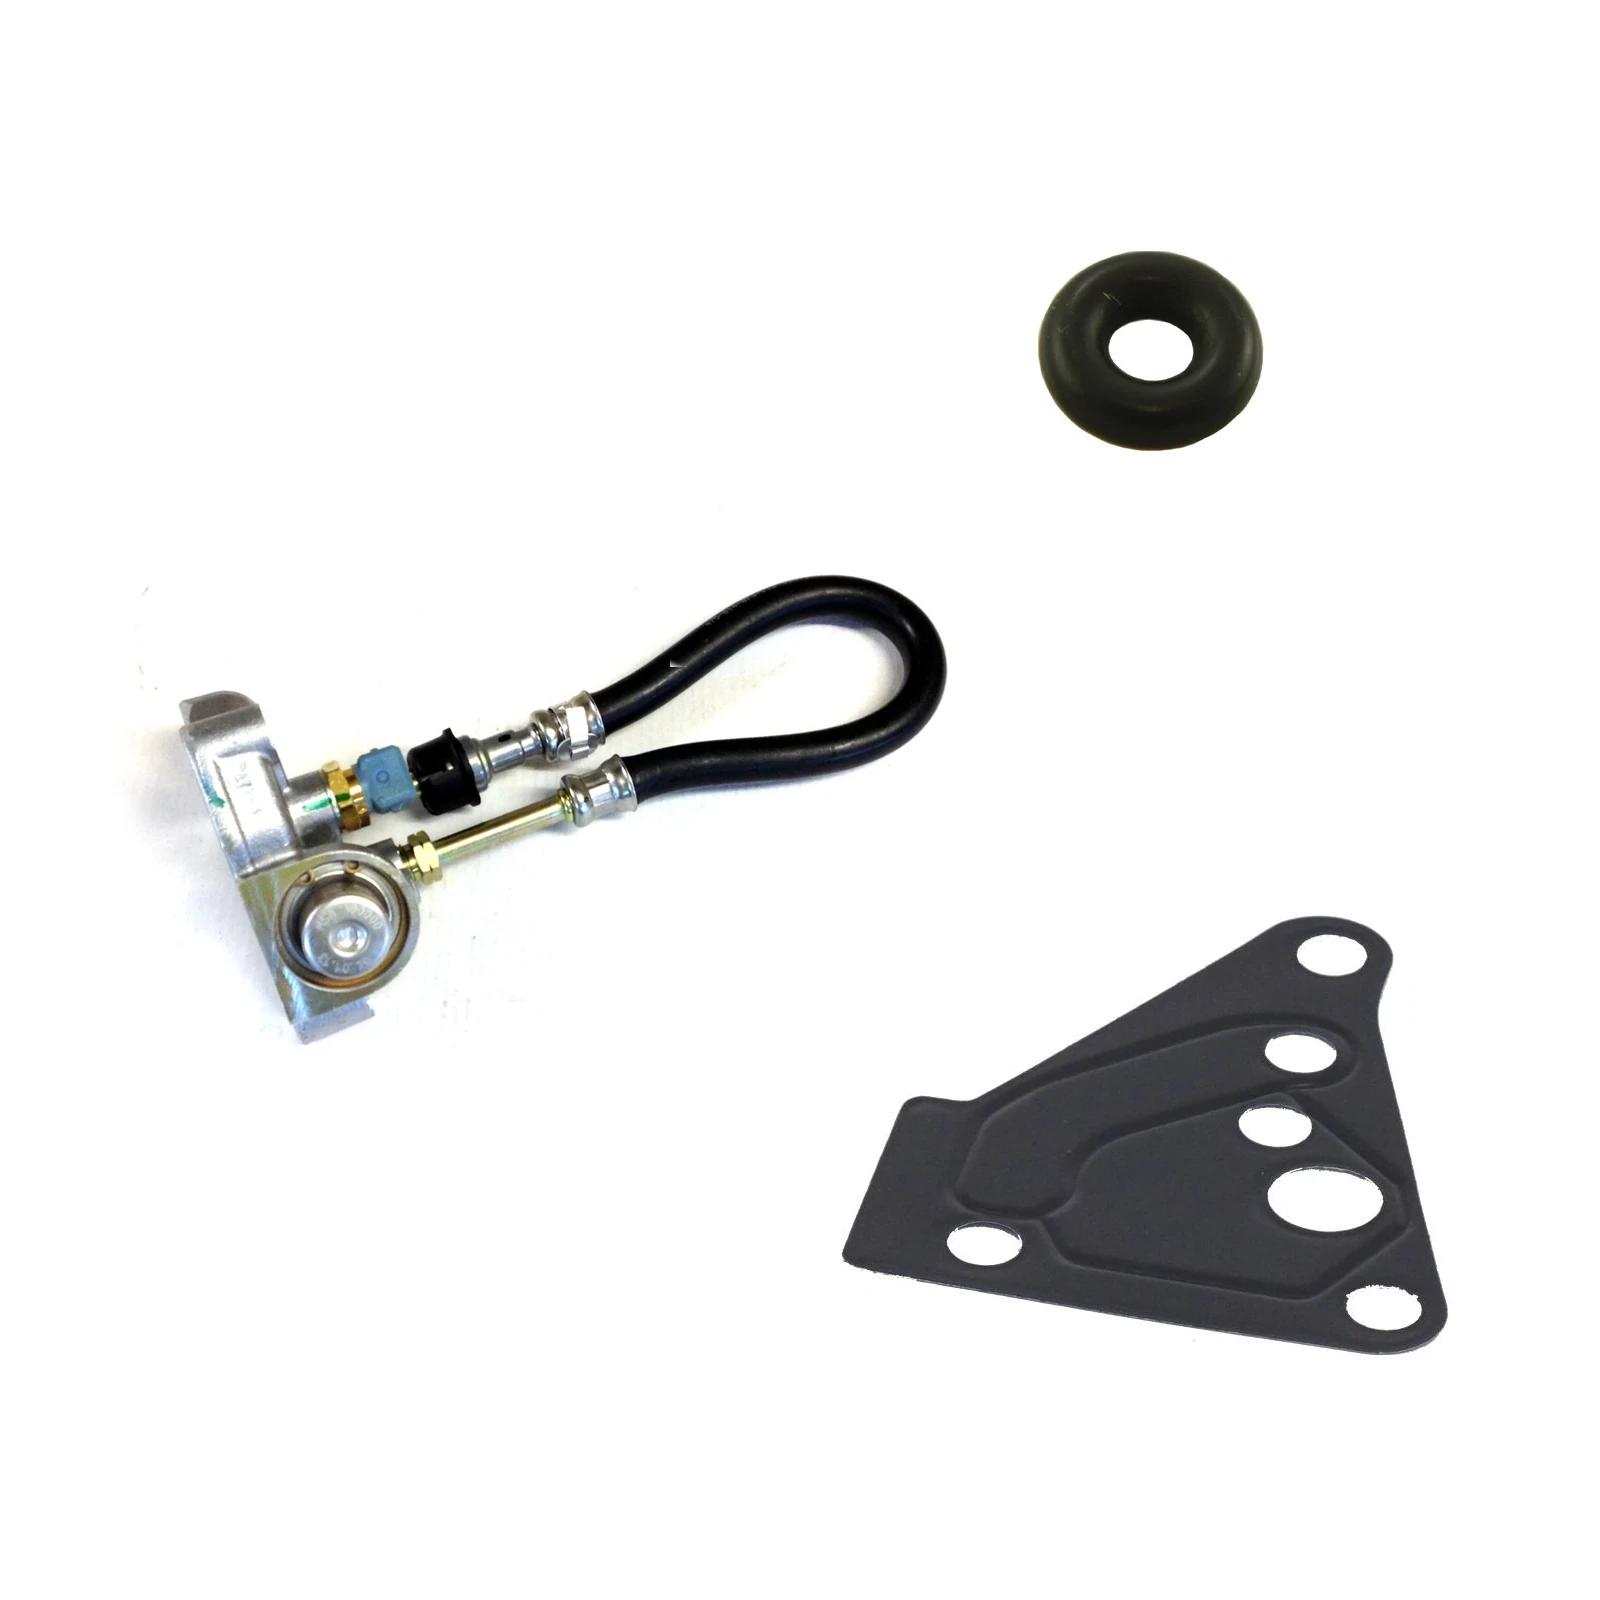 Allmakes OE Defender /& Disco TD5 Fuel Pressure Regulator Block Gasket MSX000010